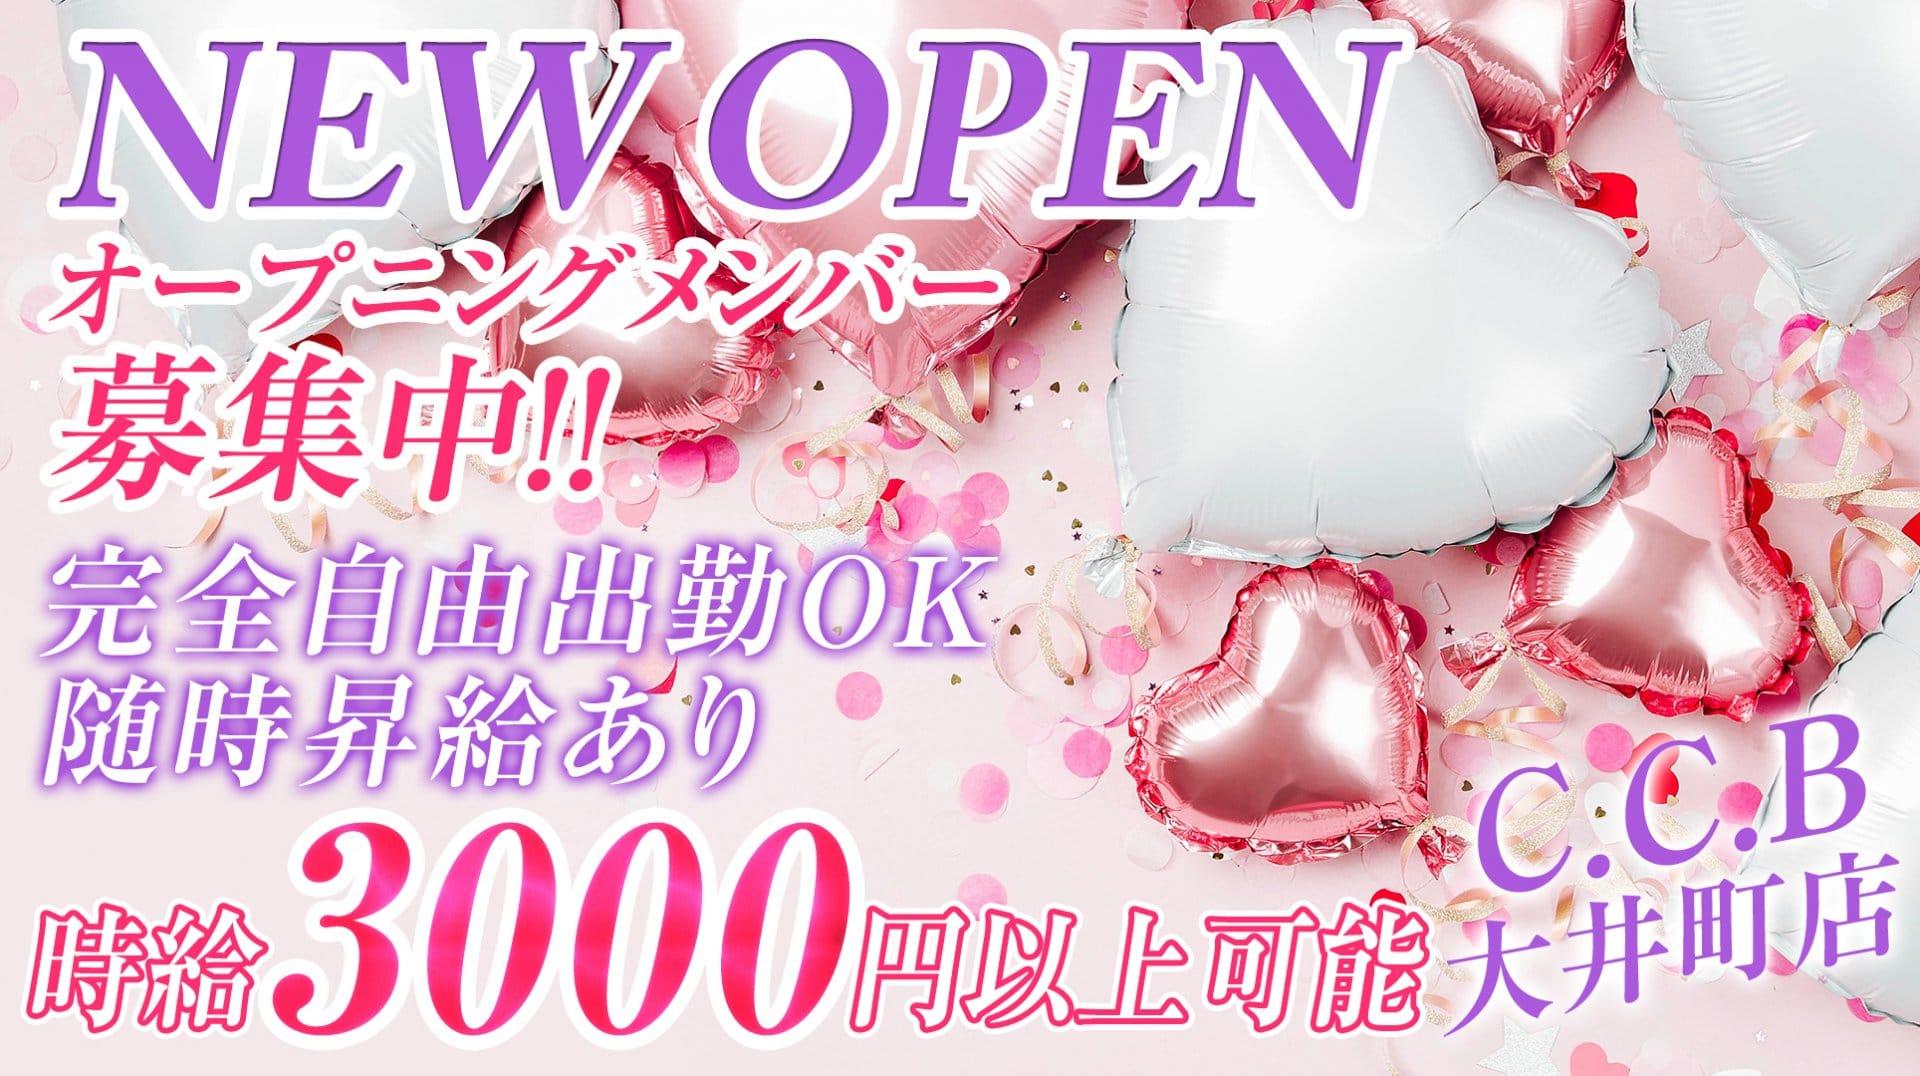 C.C.B(コミュニケーションバー)大井町店 渋谷ガールズバー TOP画像